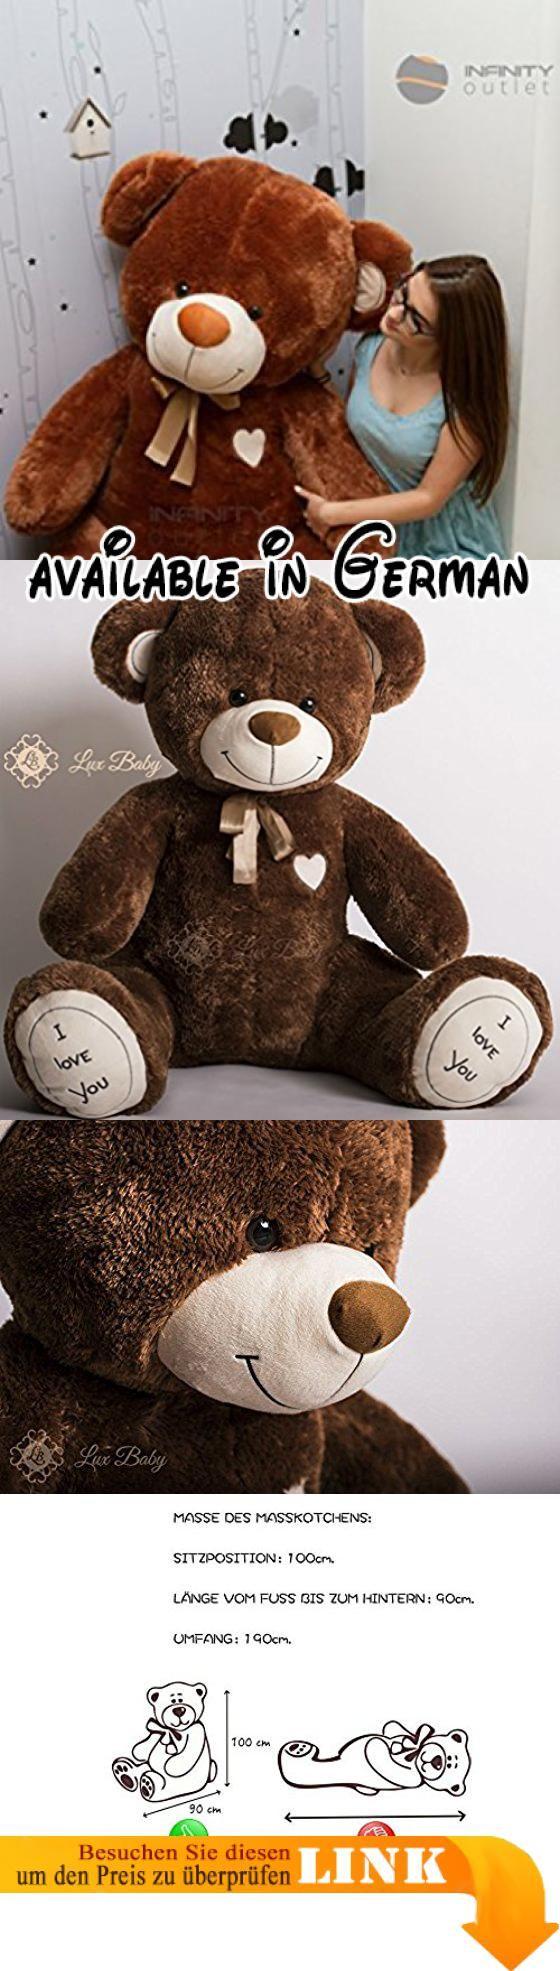 CHARLIE Farbe: BRAUN XXXL groß Teddybär Riesen Stofftier Kuschelbär ...